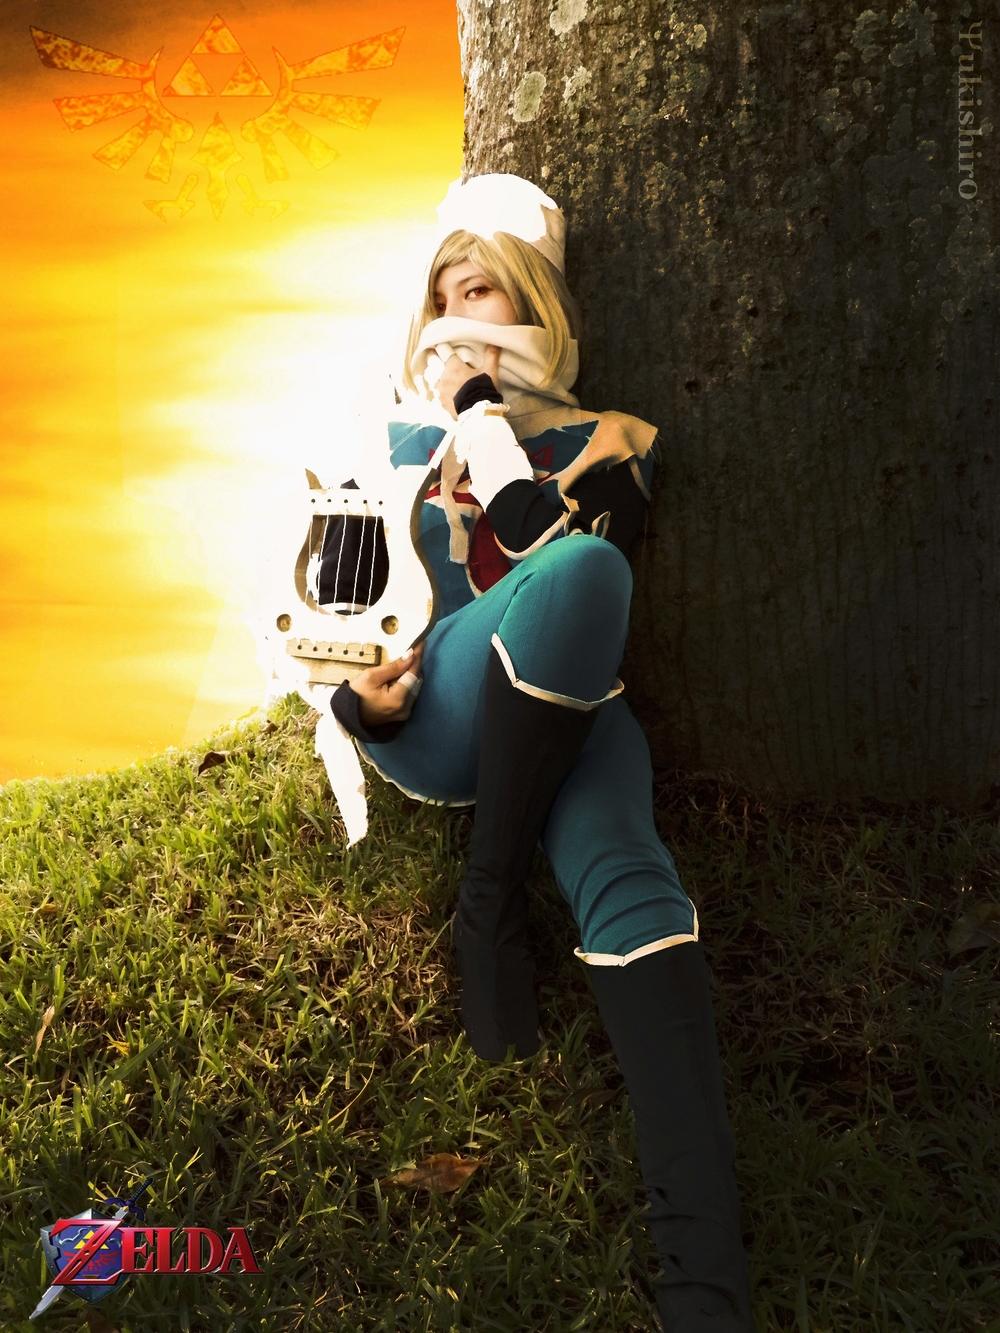 IIMishall is Zelda (Sheik) | Photo by: Yukishir0